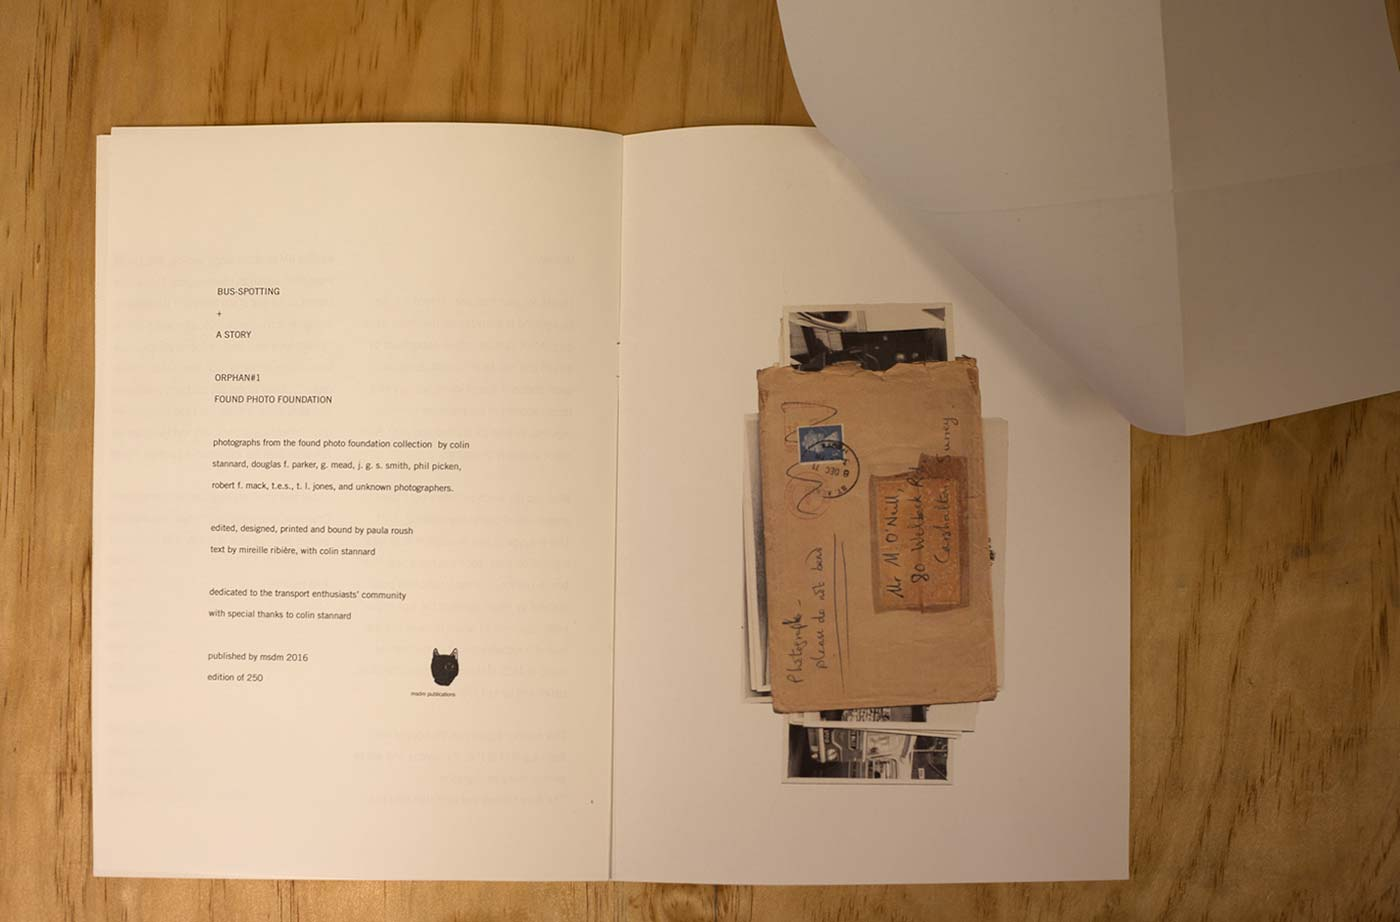 paula-roush-bus-spotting-photobook-msdm-publications-orphan1-50